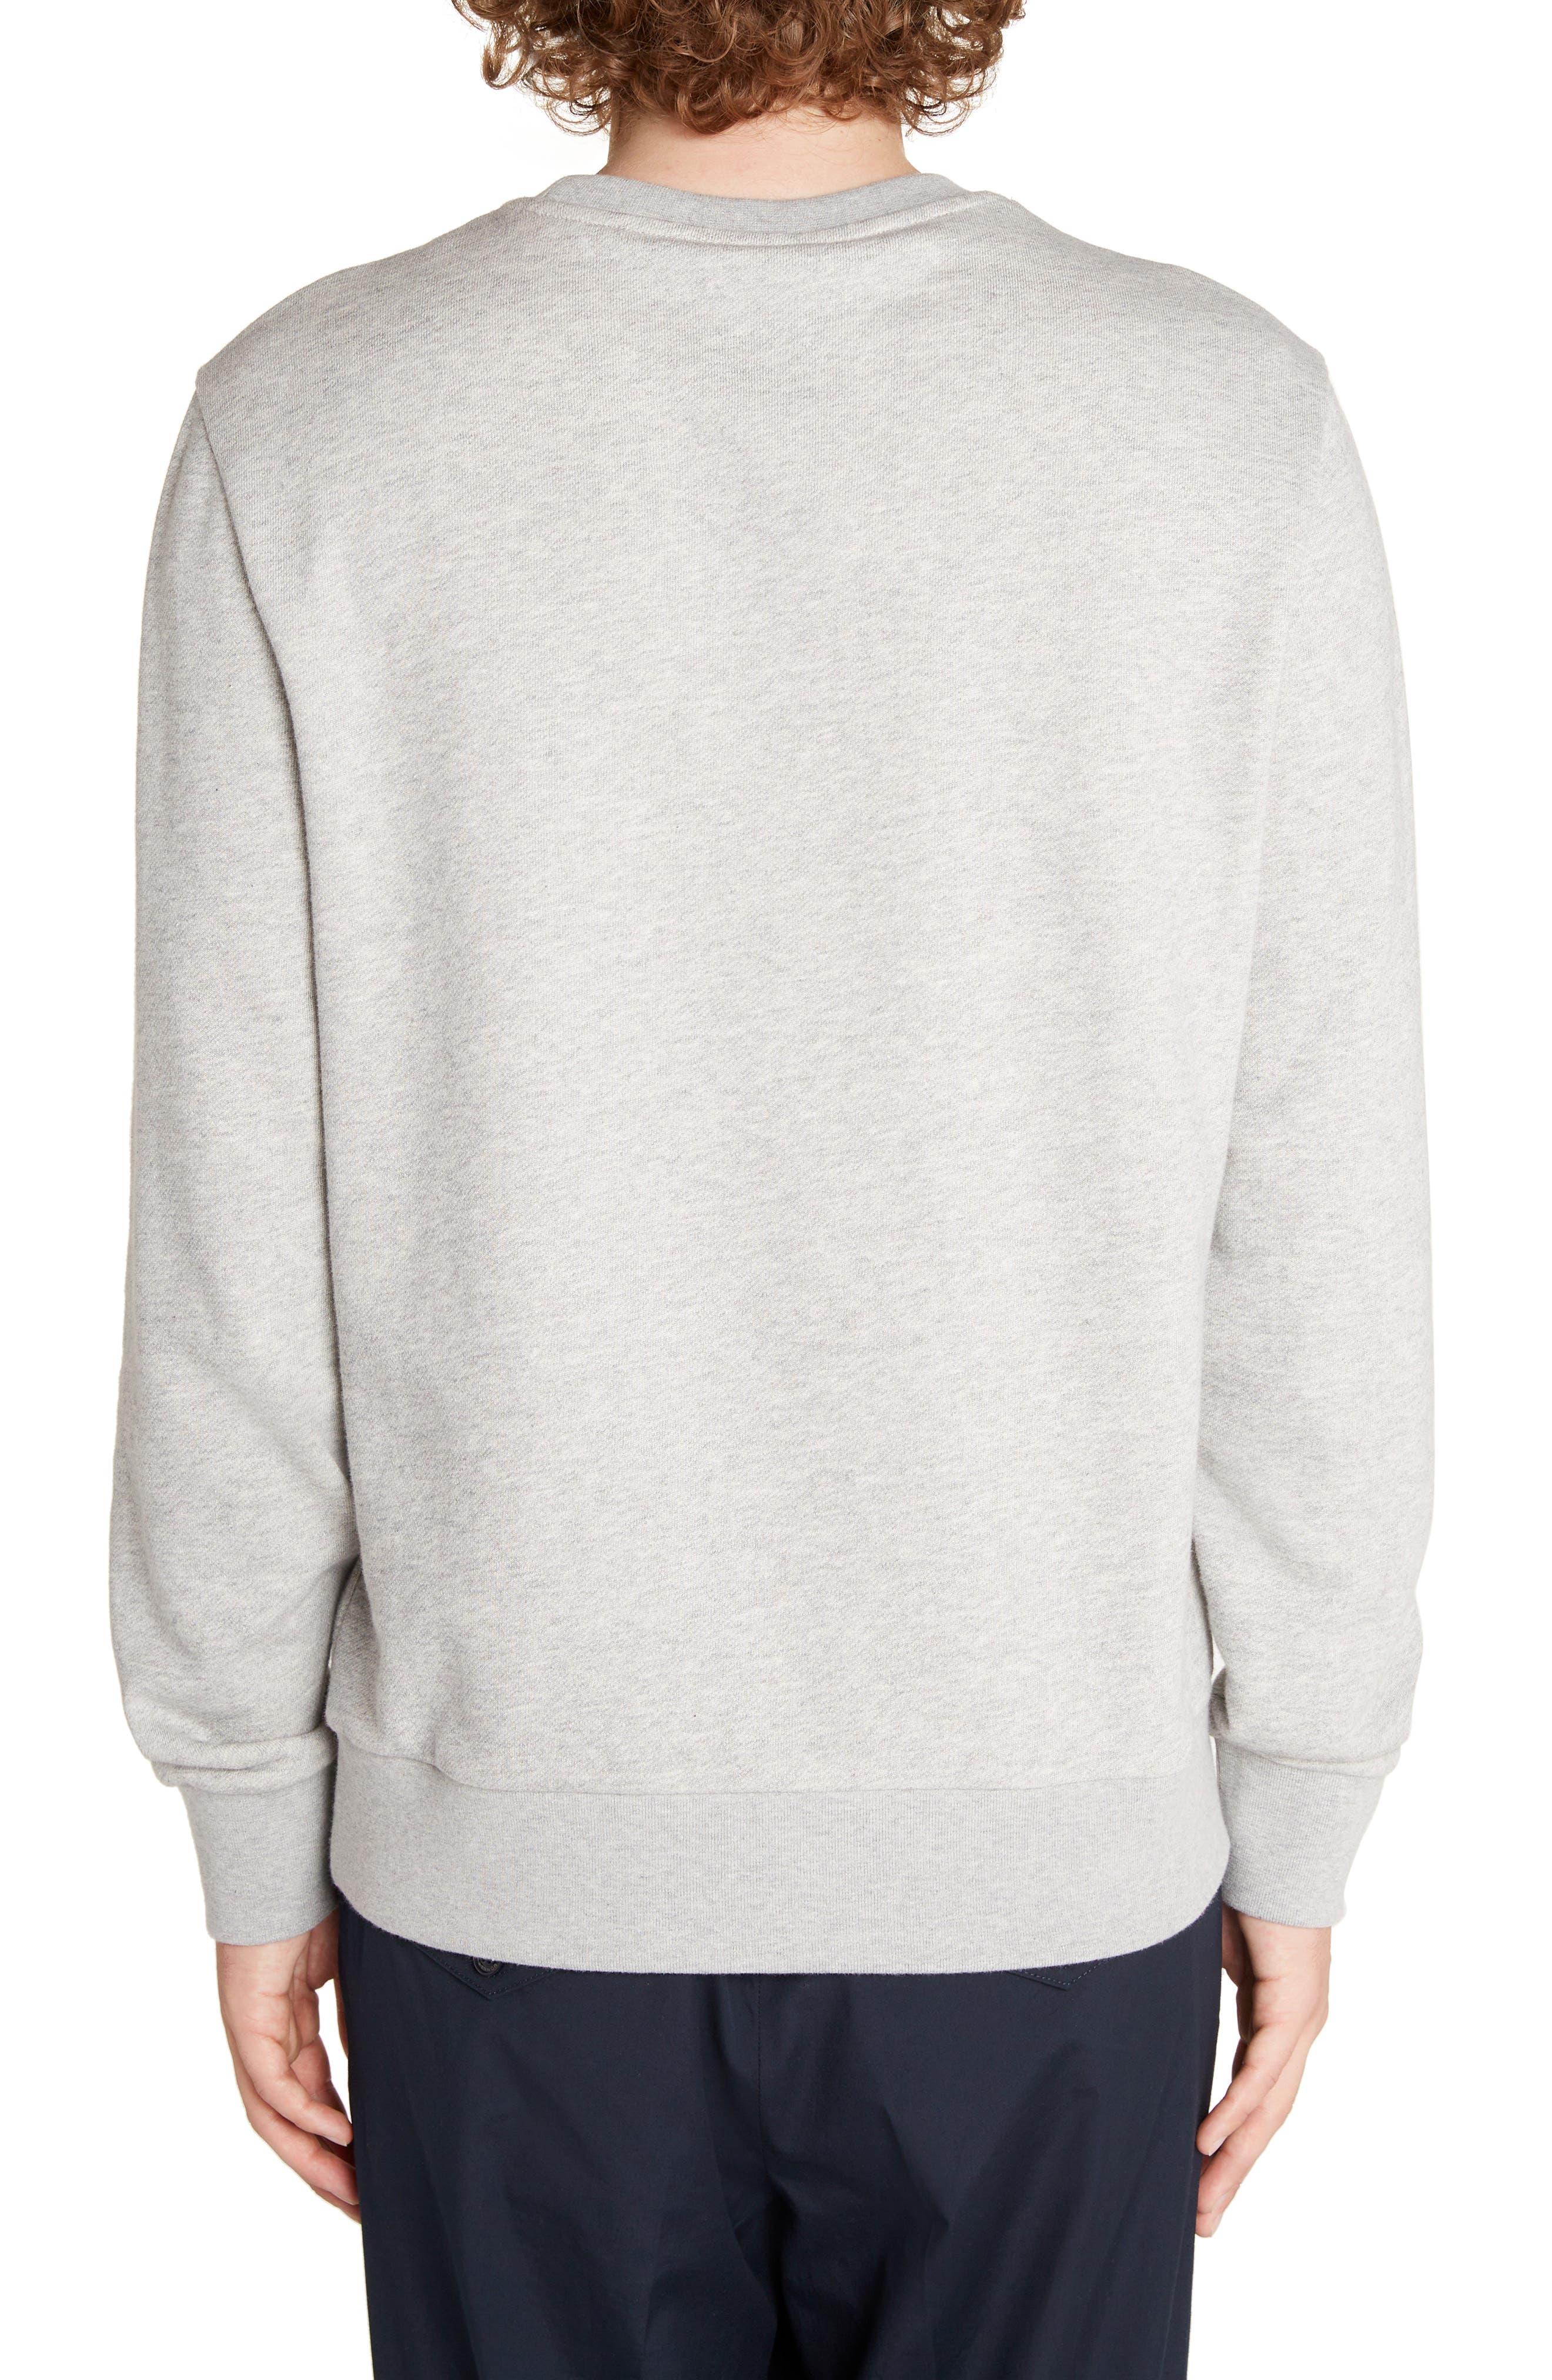 MONCLER,                             Logo Crewneck Sweatshirt,                             Alternate thumbnail 2, color,                             DARK GREY